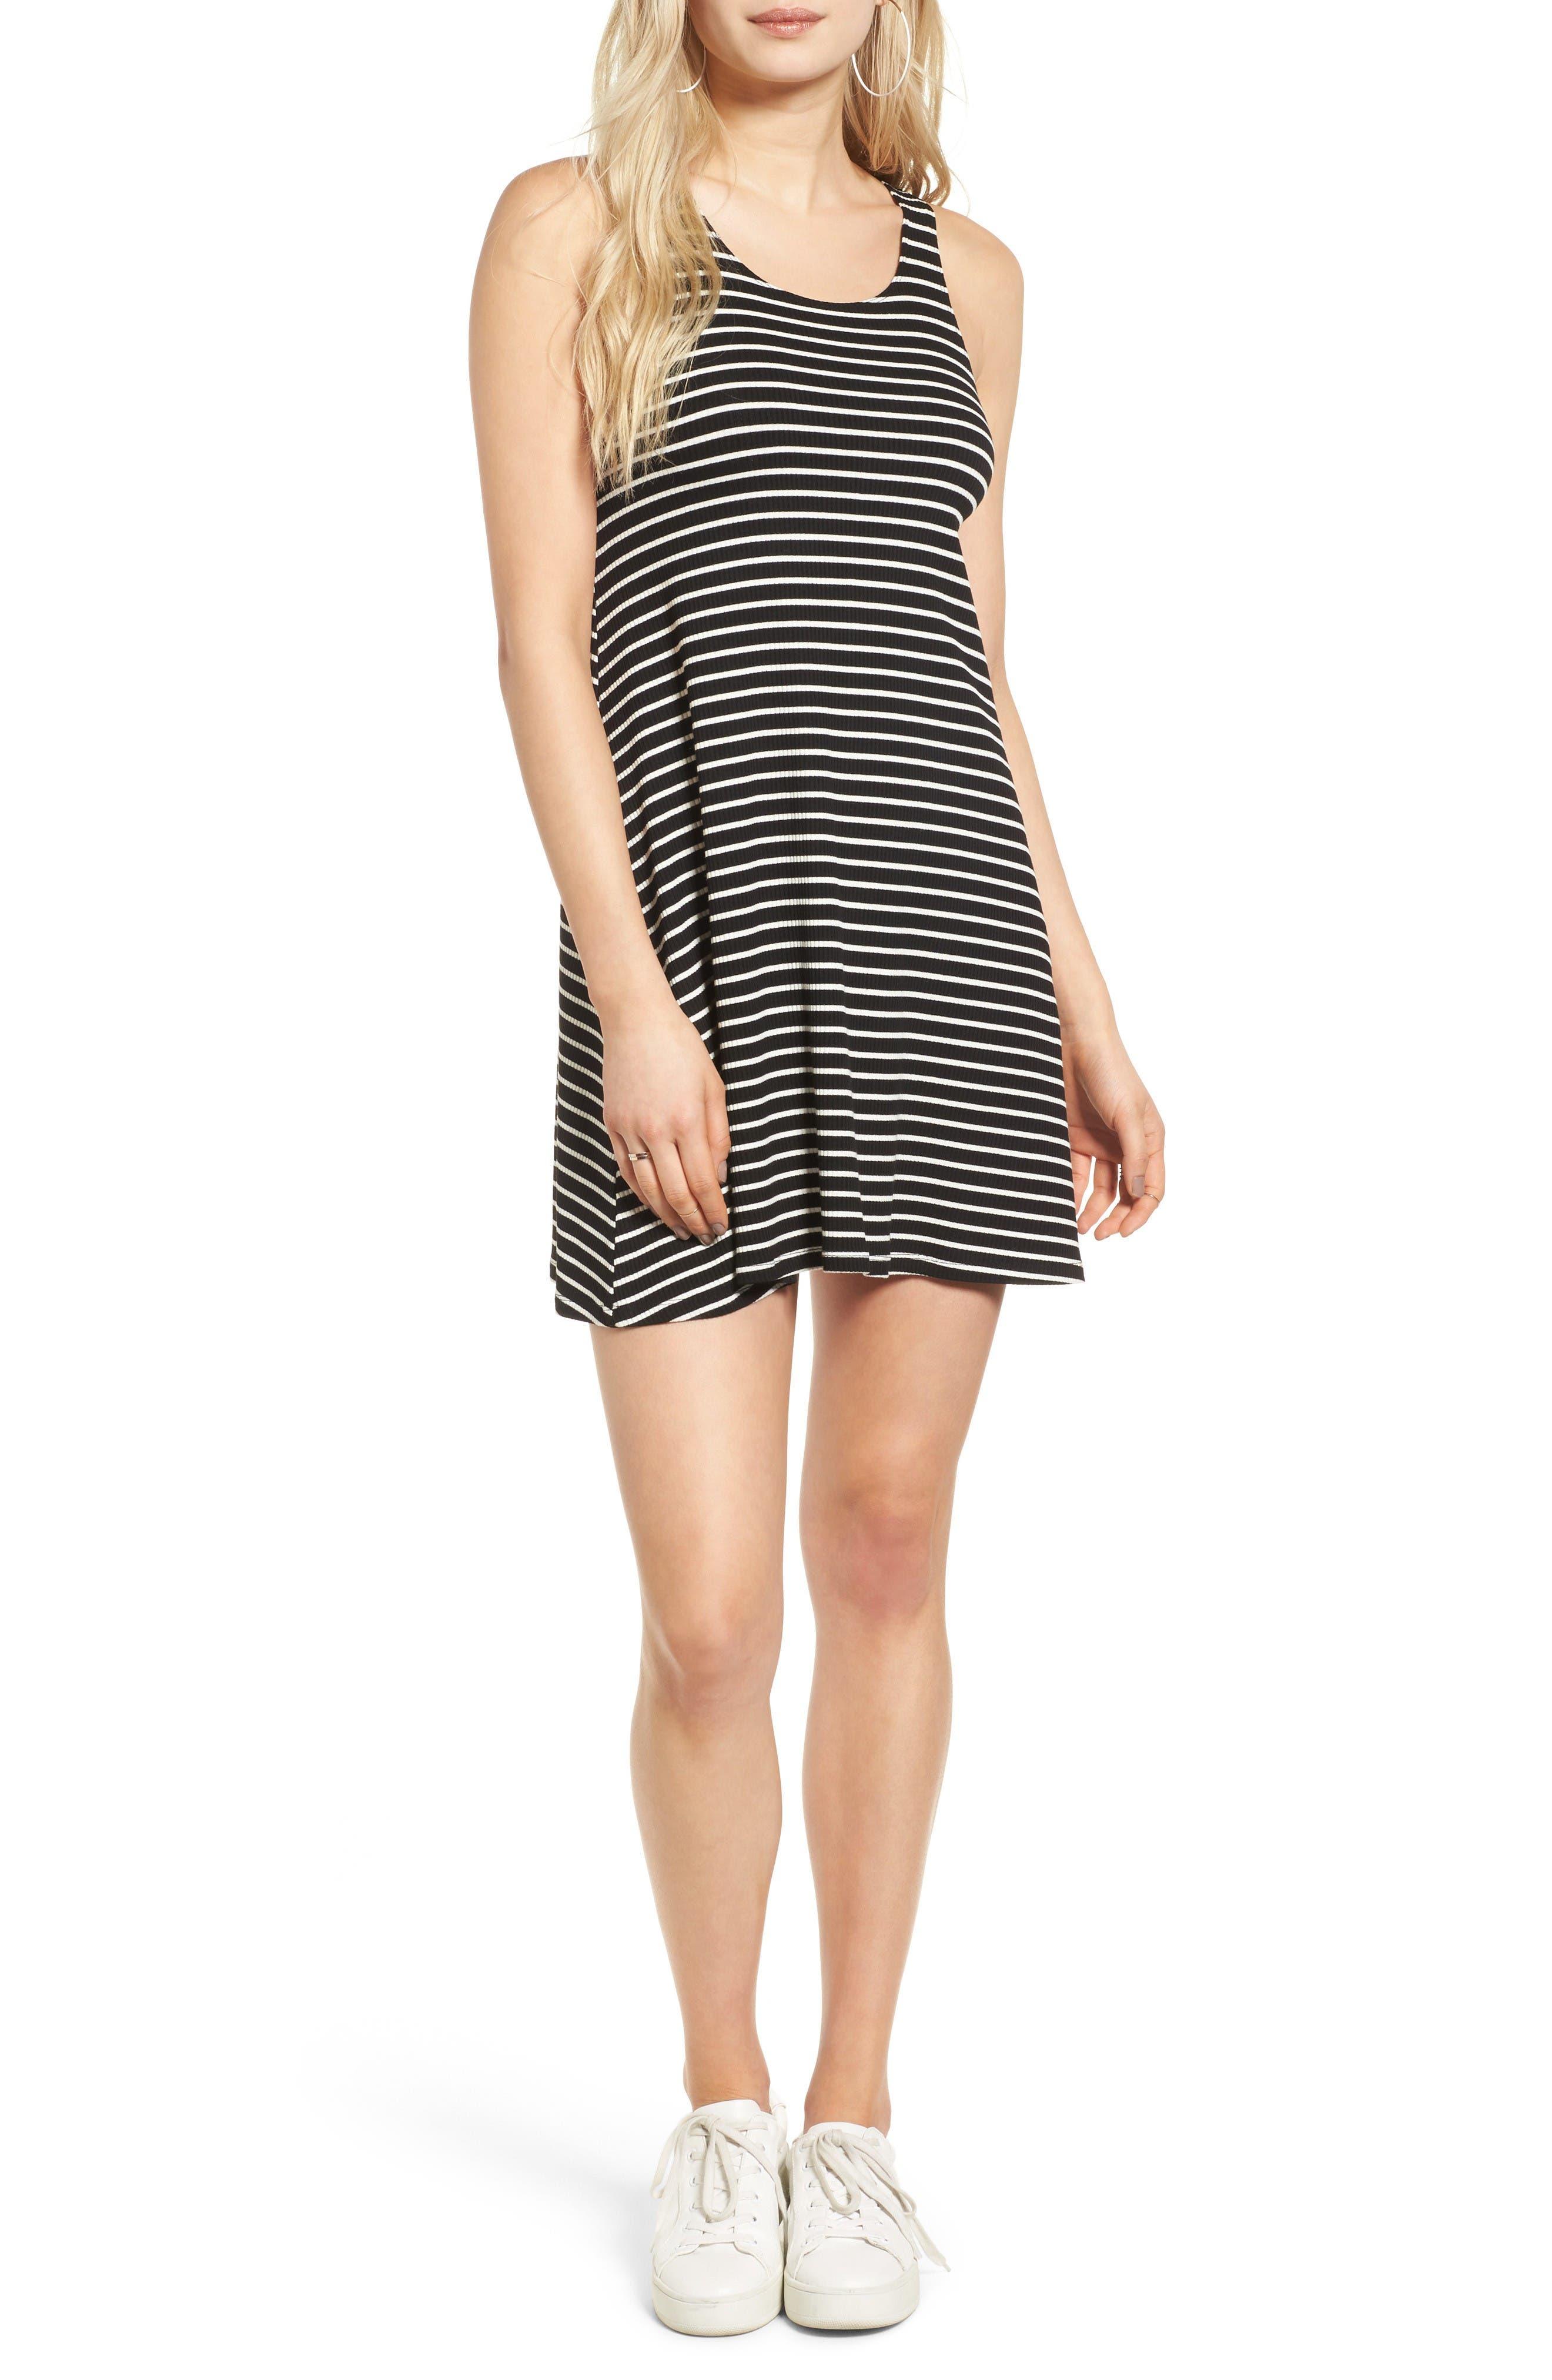 Lira Clothing Bondi Stripe Dress